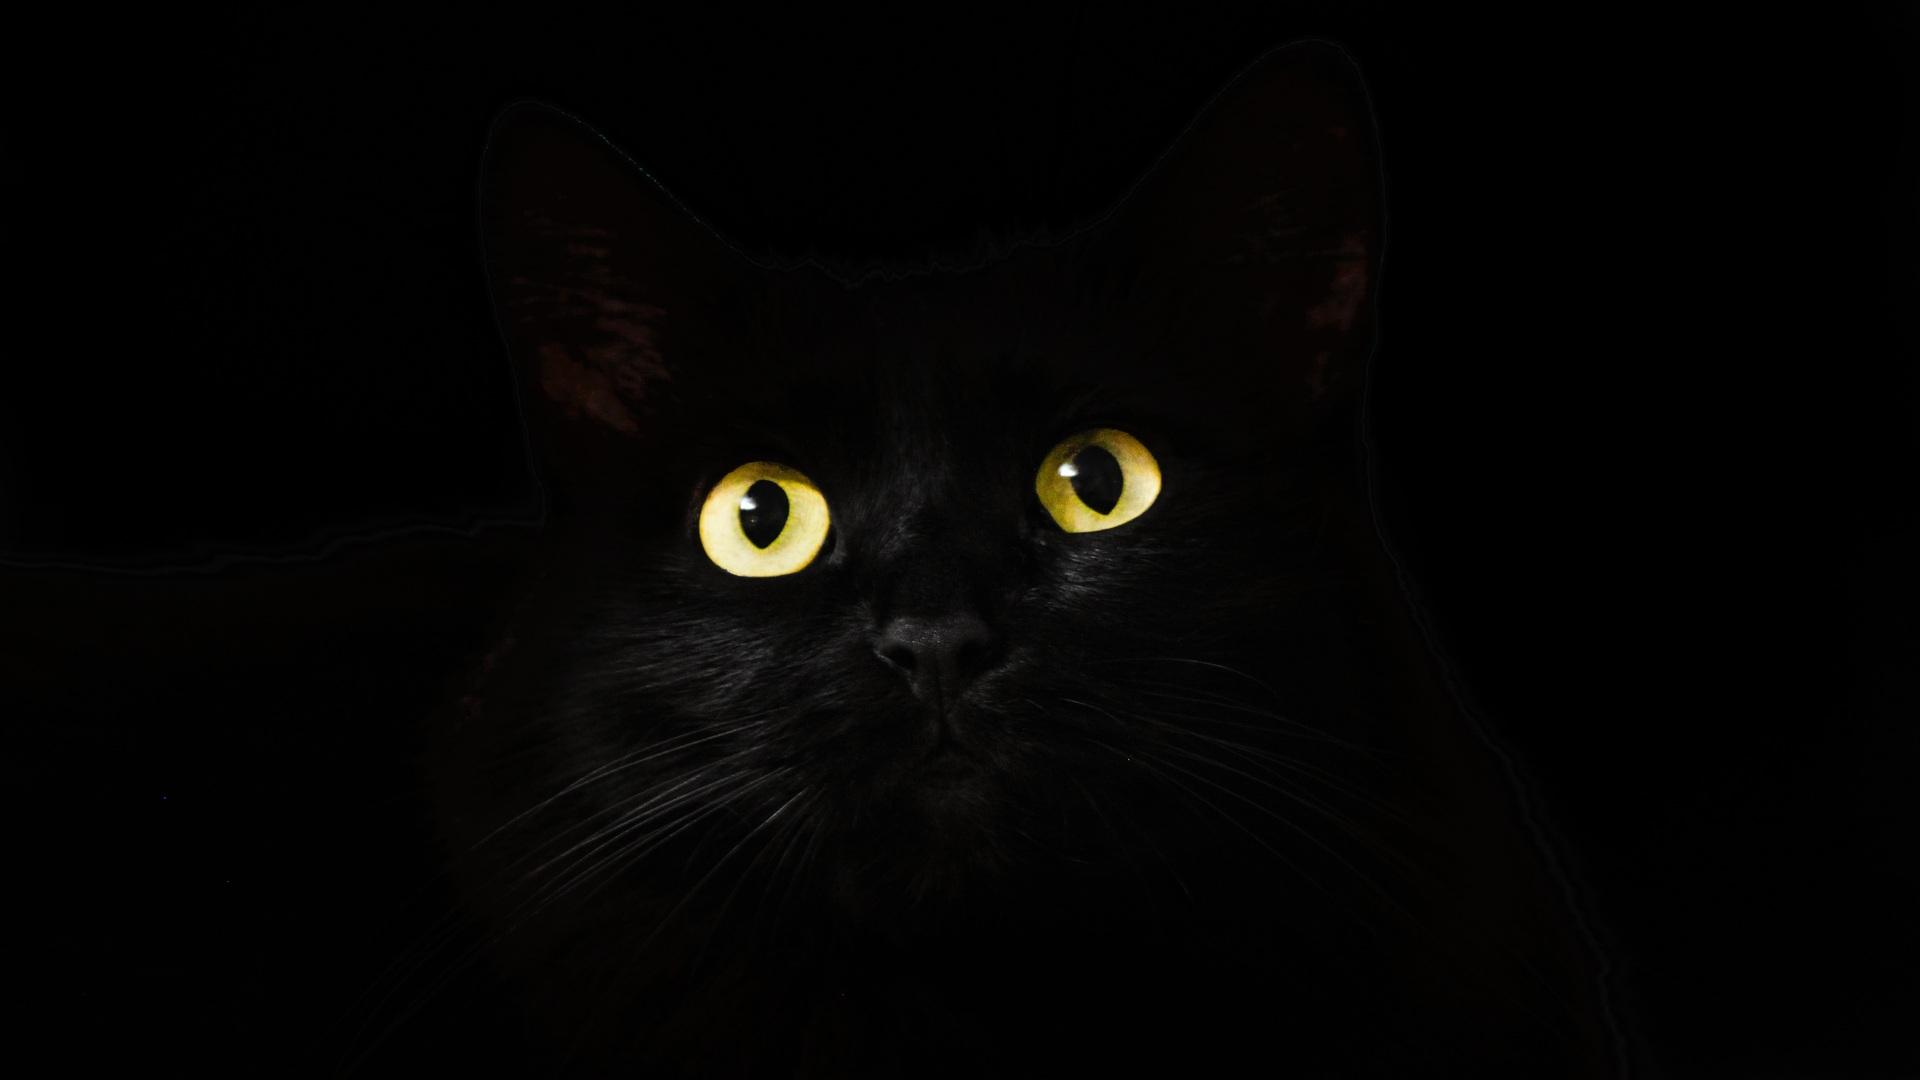 1920x1080 Black Cat Eyes Dark 5k Laptop Full Hd 1080p Hd 4k